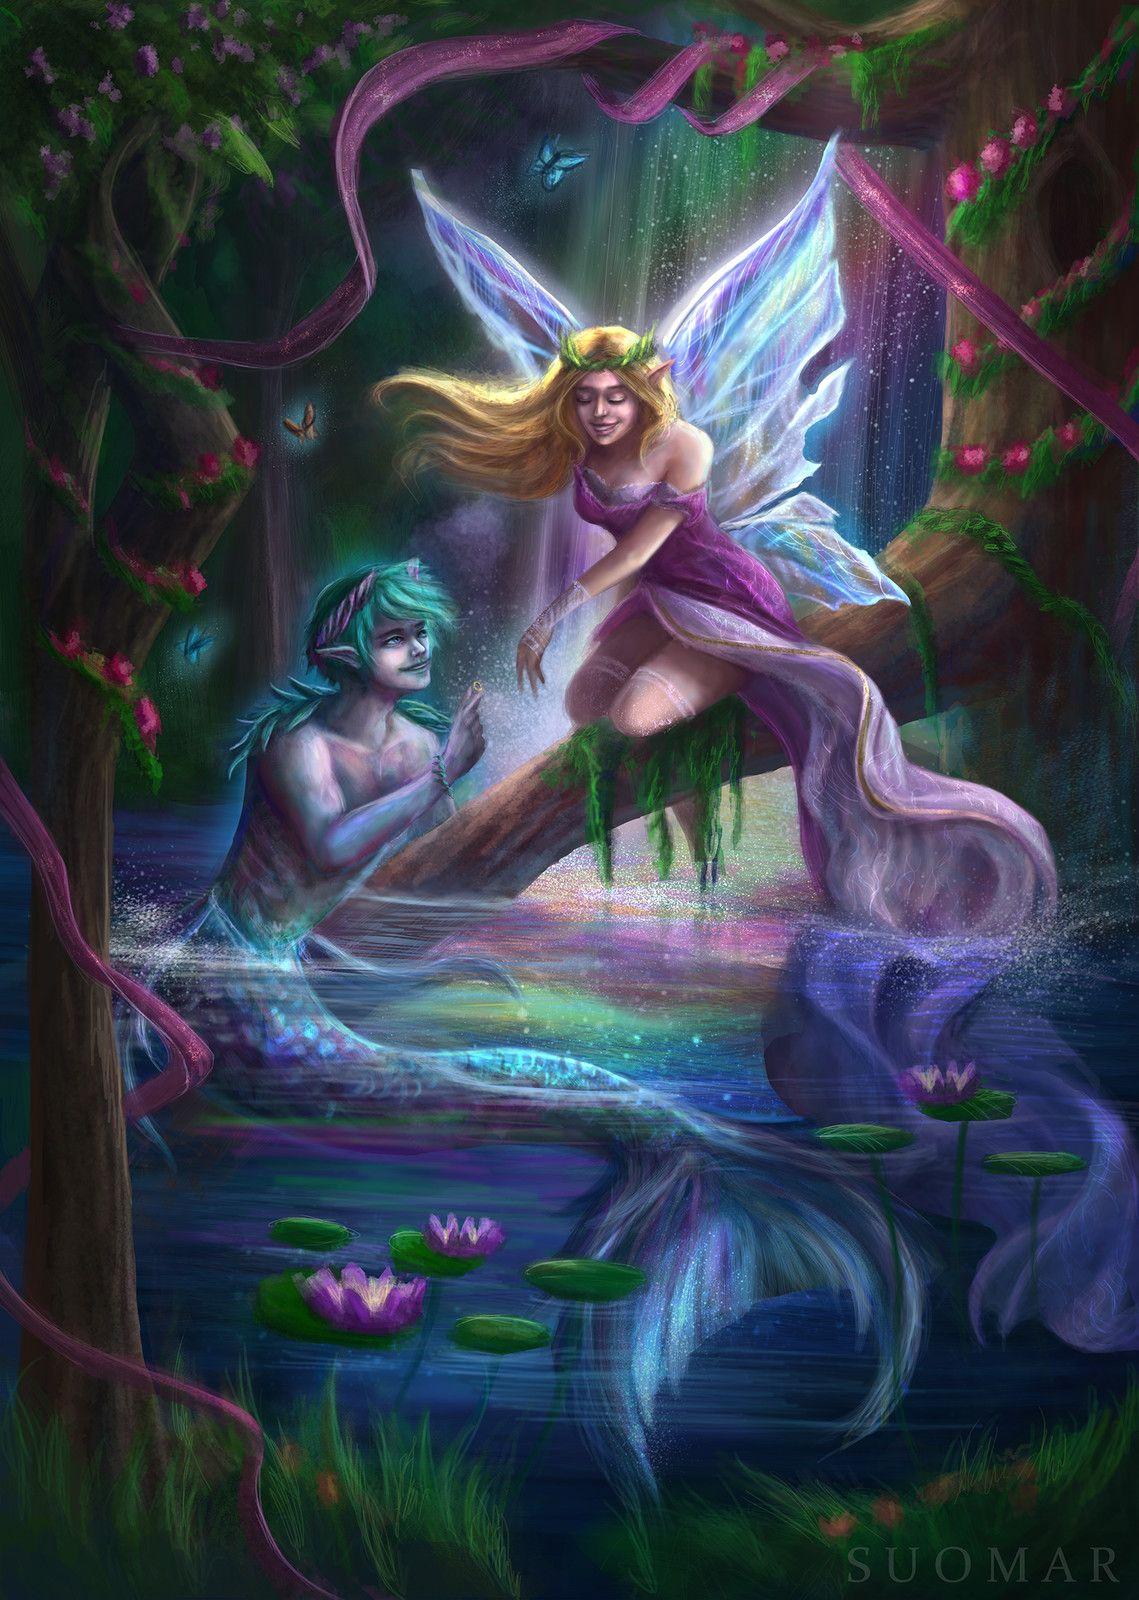 The Sweetest Dreams Come True Suo Mar On Artstation At Https Www Artstation Com Artwork Onvoj Fantasy Mermaids Mermaid Art Mermaid Painting